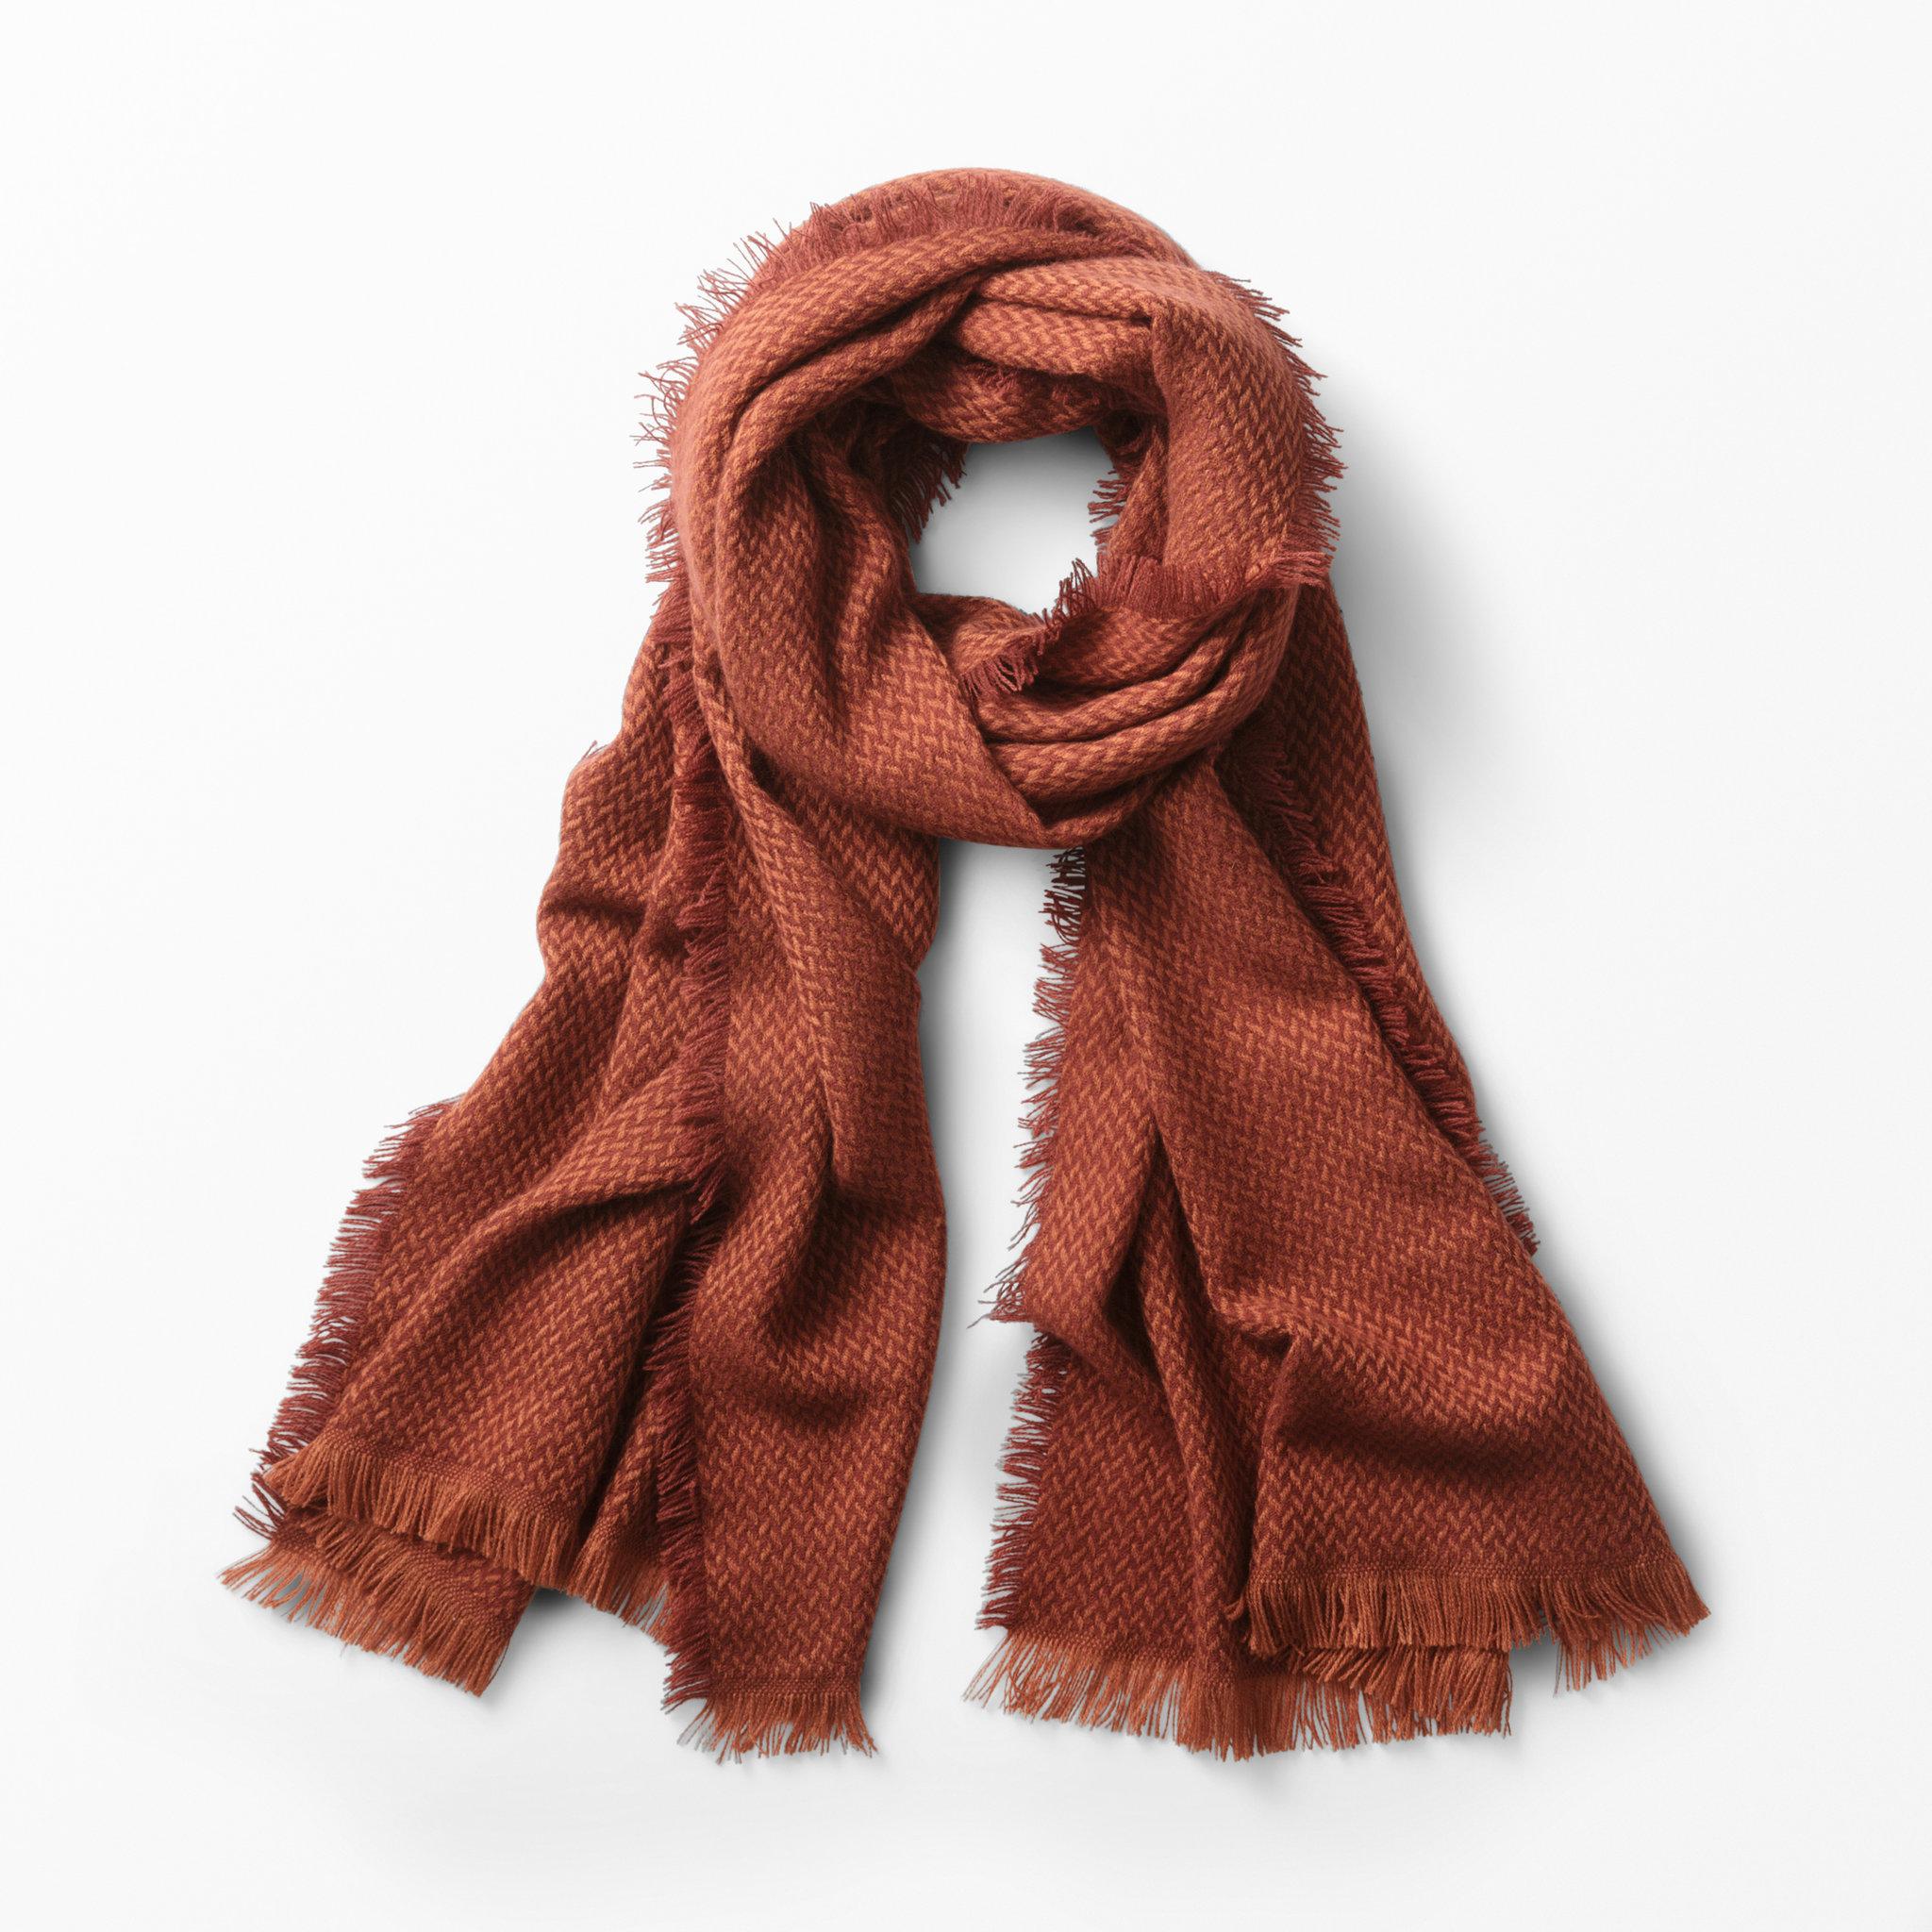 Scarf med fransar - Halsdukar   scarves - Köp online på åhlens.se! c82820d93600c